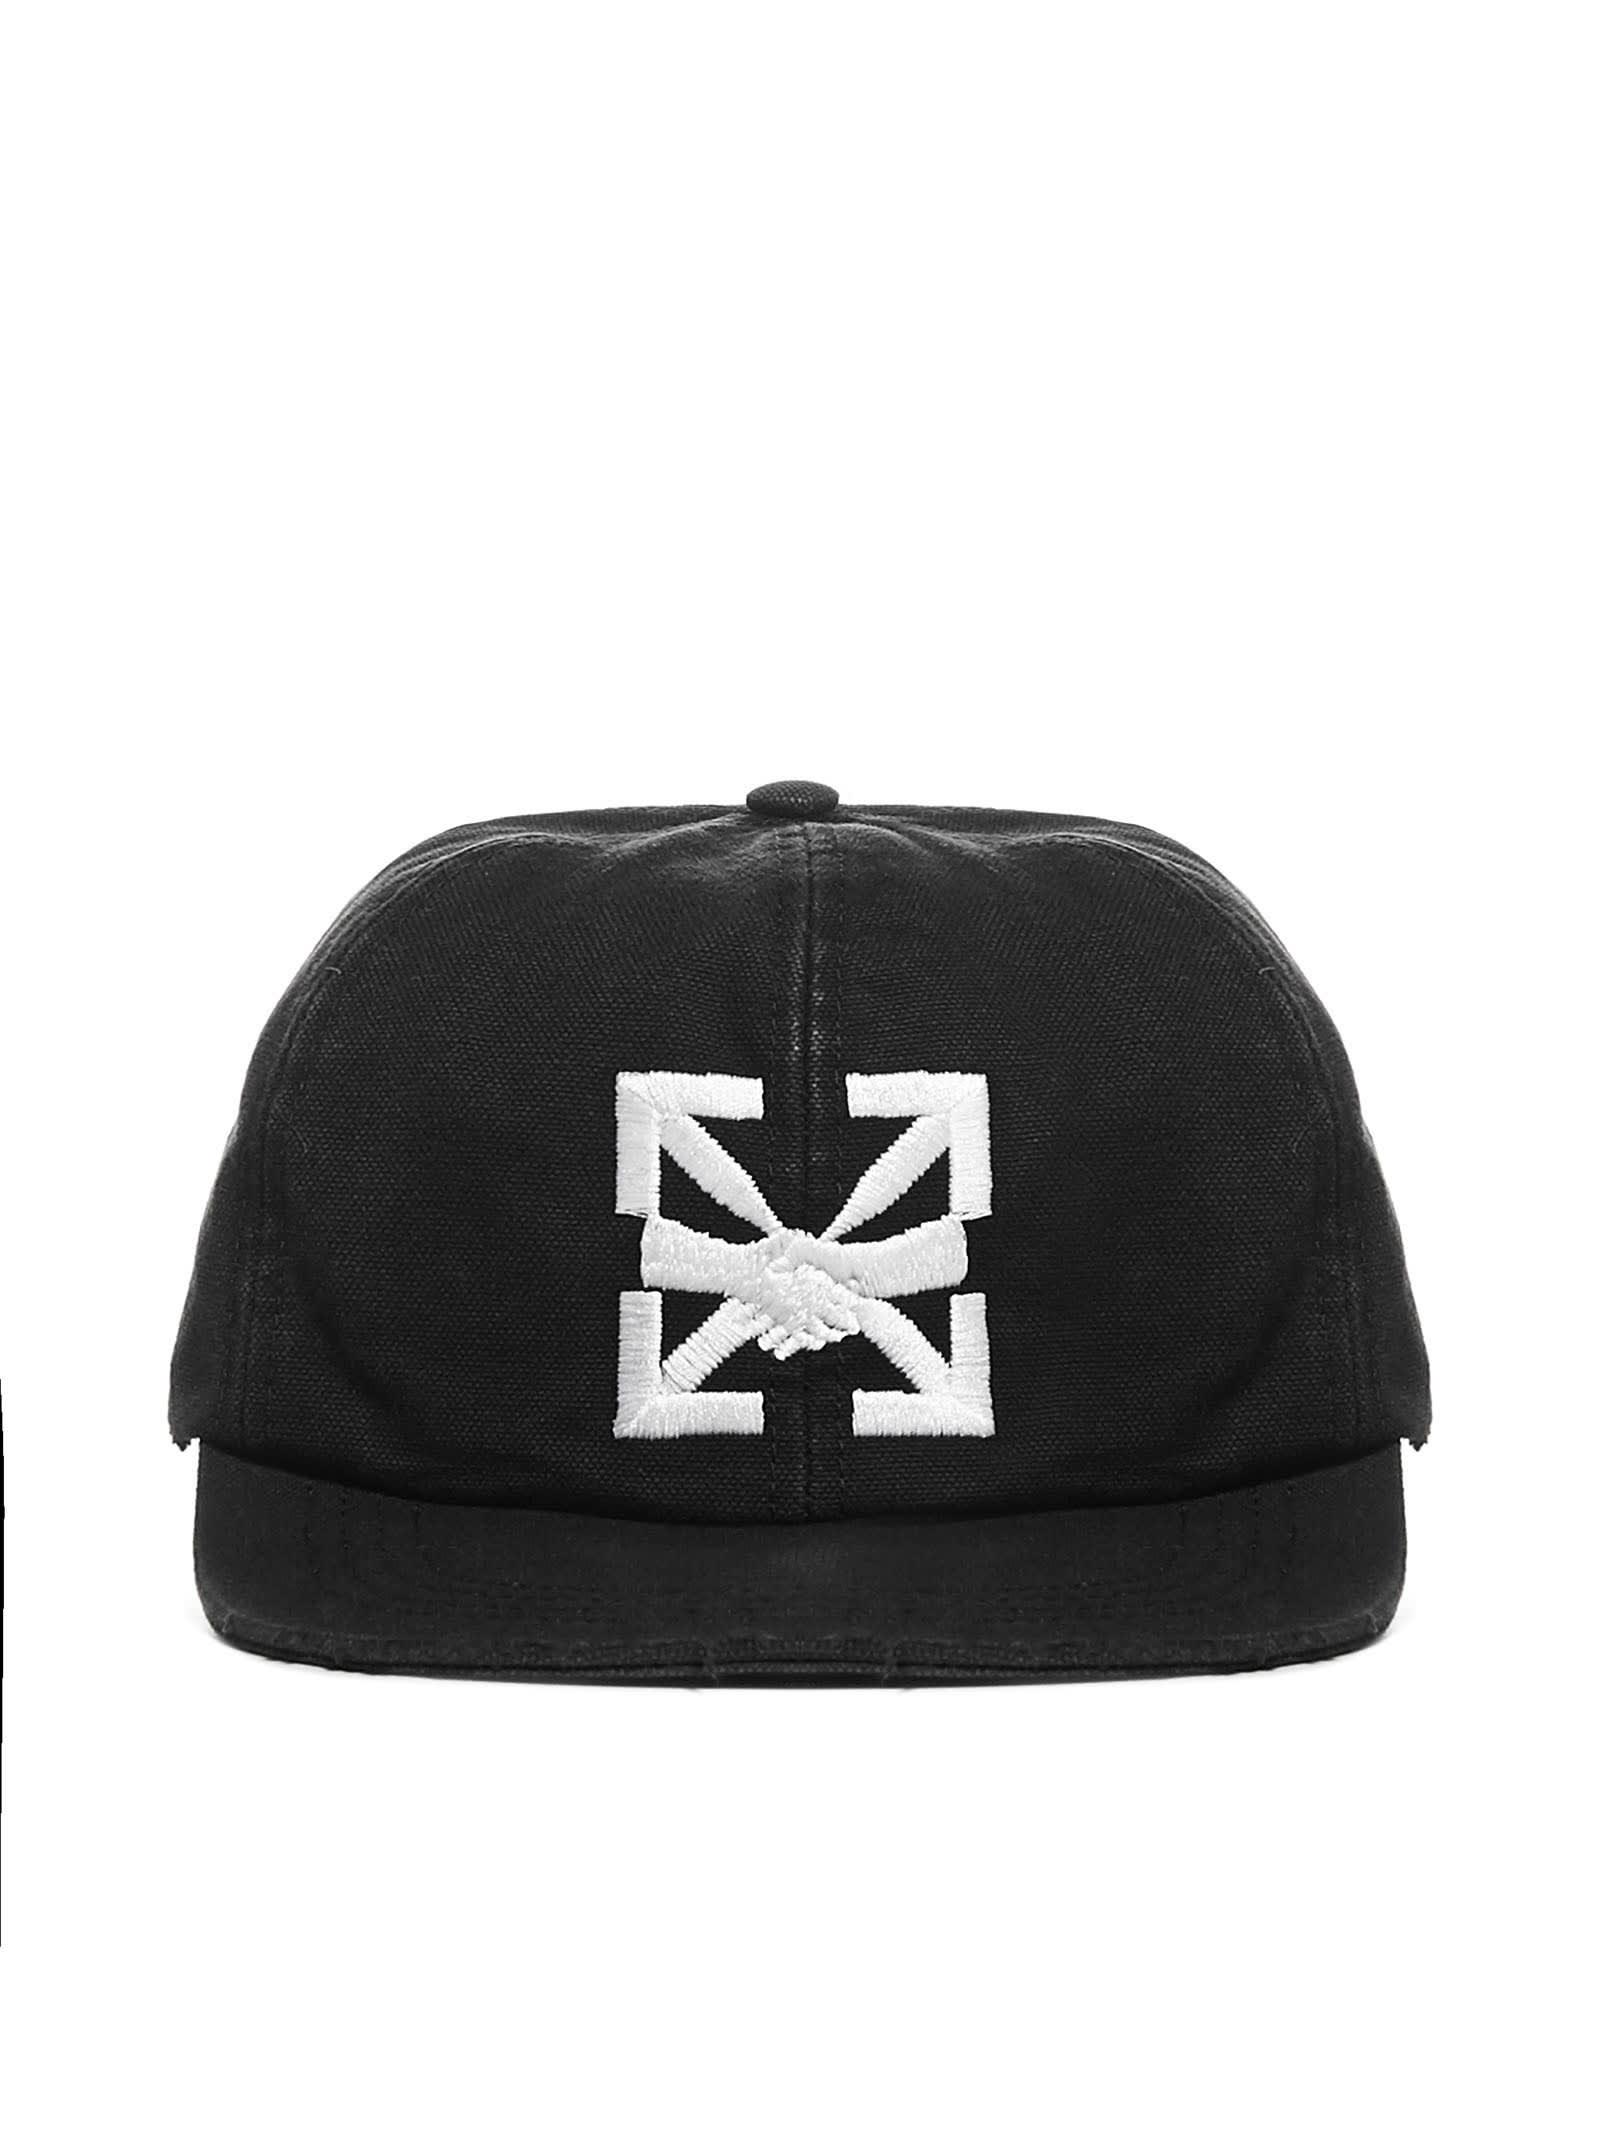 Off-White Caps HAT